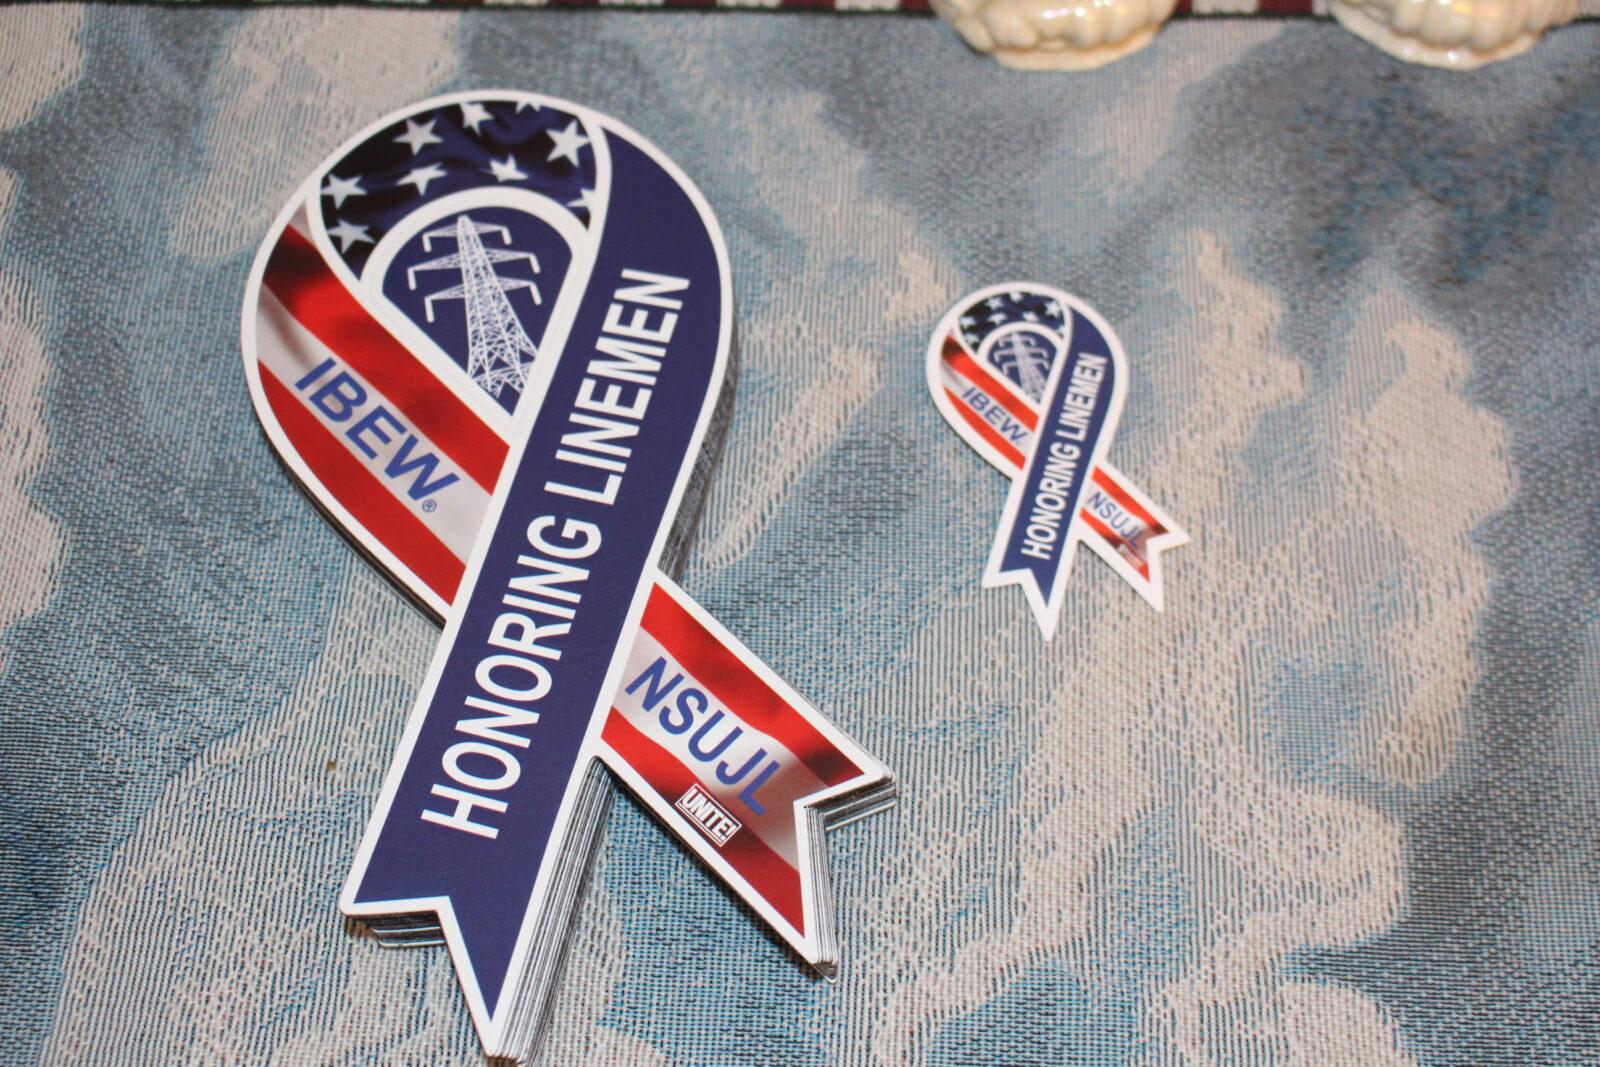 Fallen Linemen Awareness Ribbon hard hat stickers